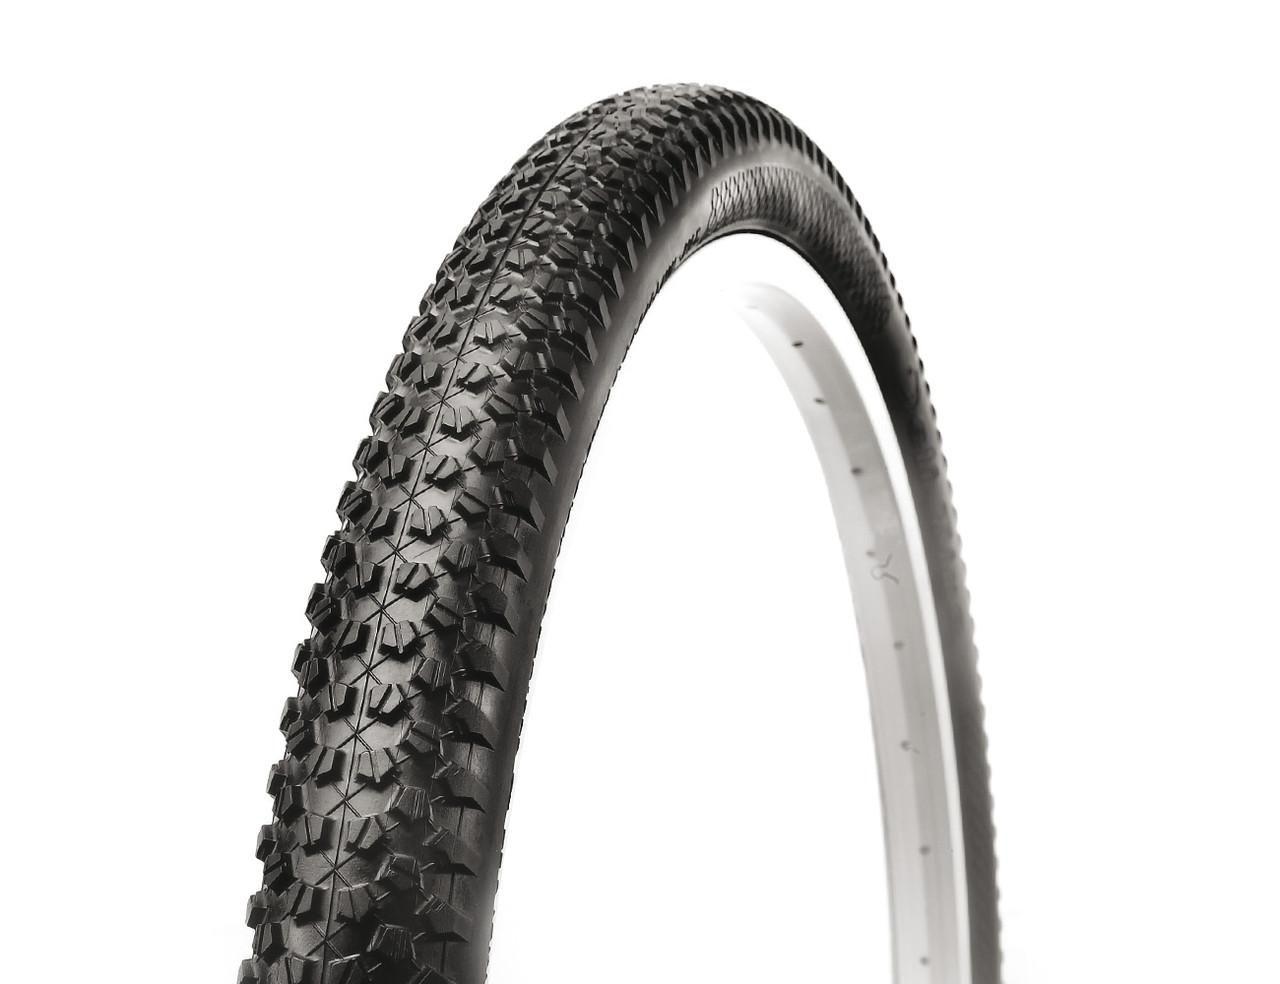 Велопокрышка 26x1.95 50-559 SA-254 Deli Tire